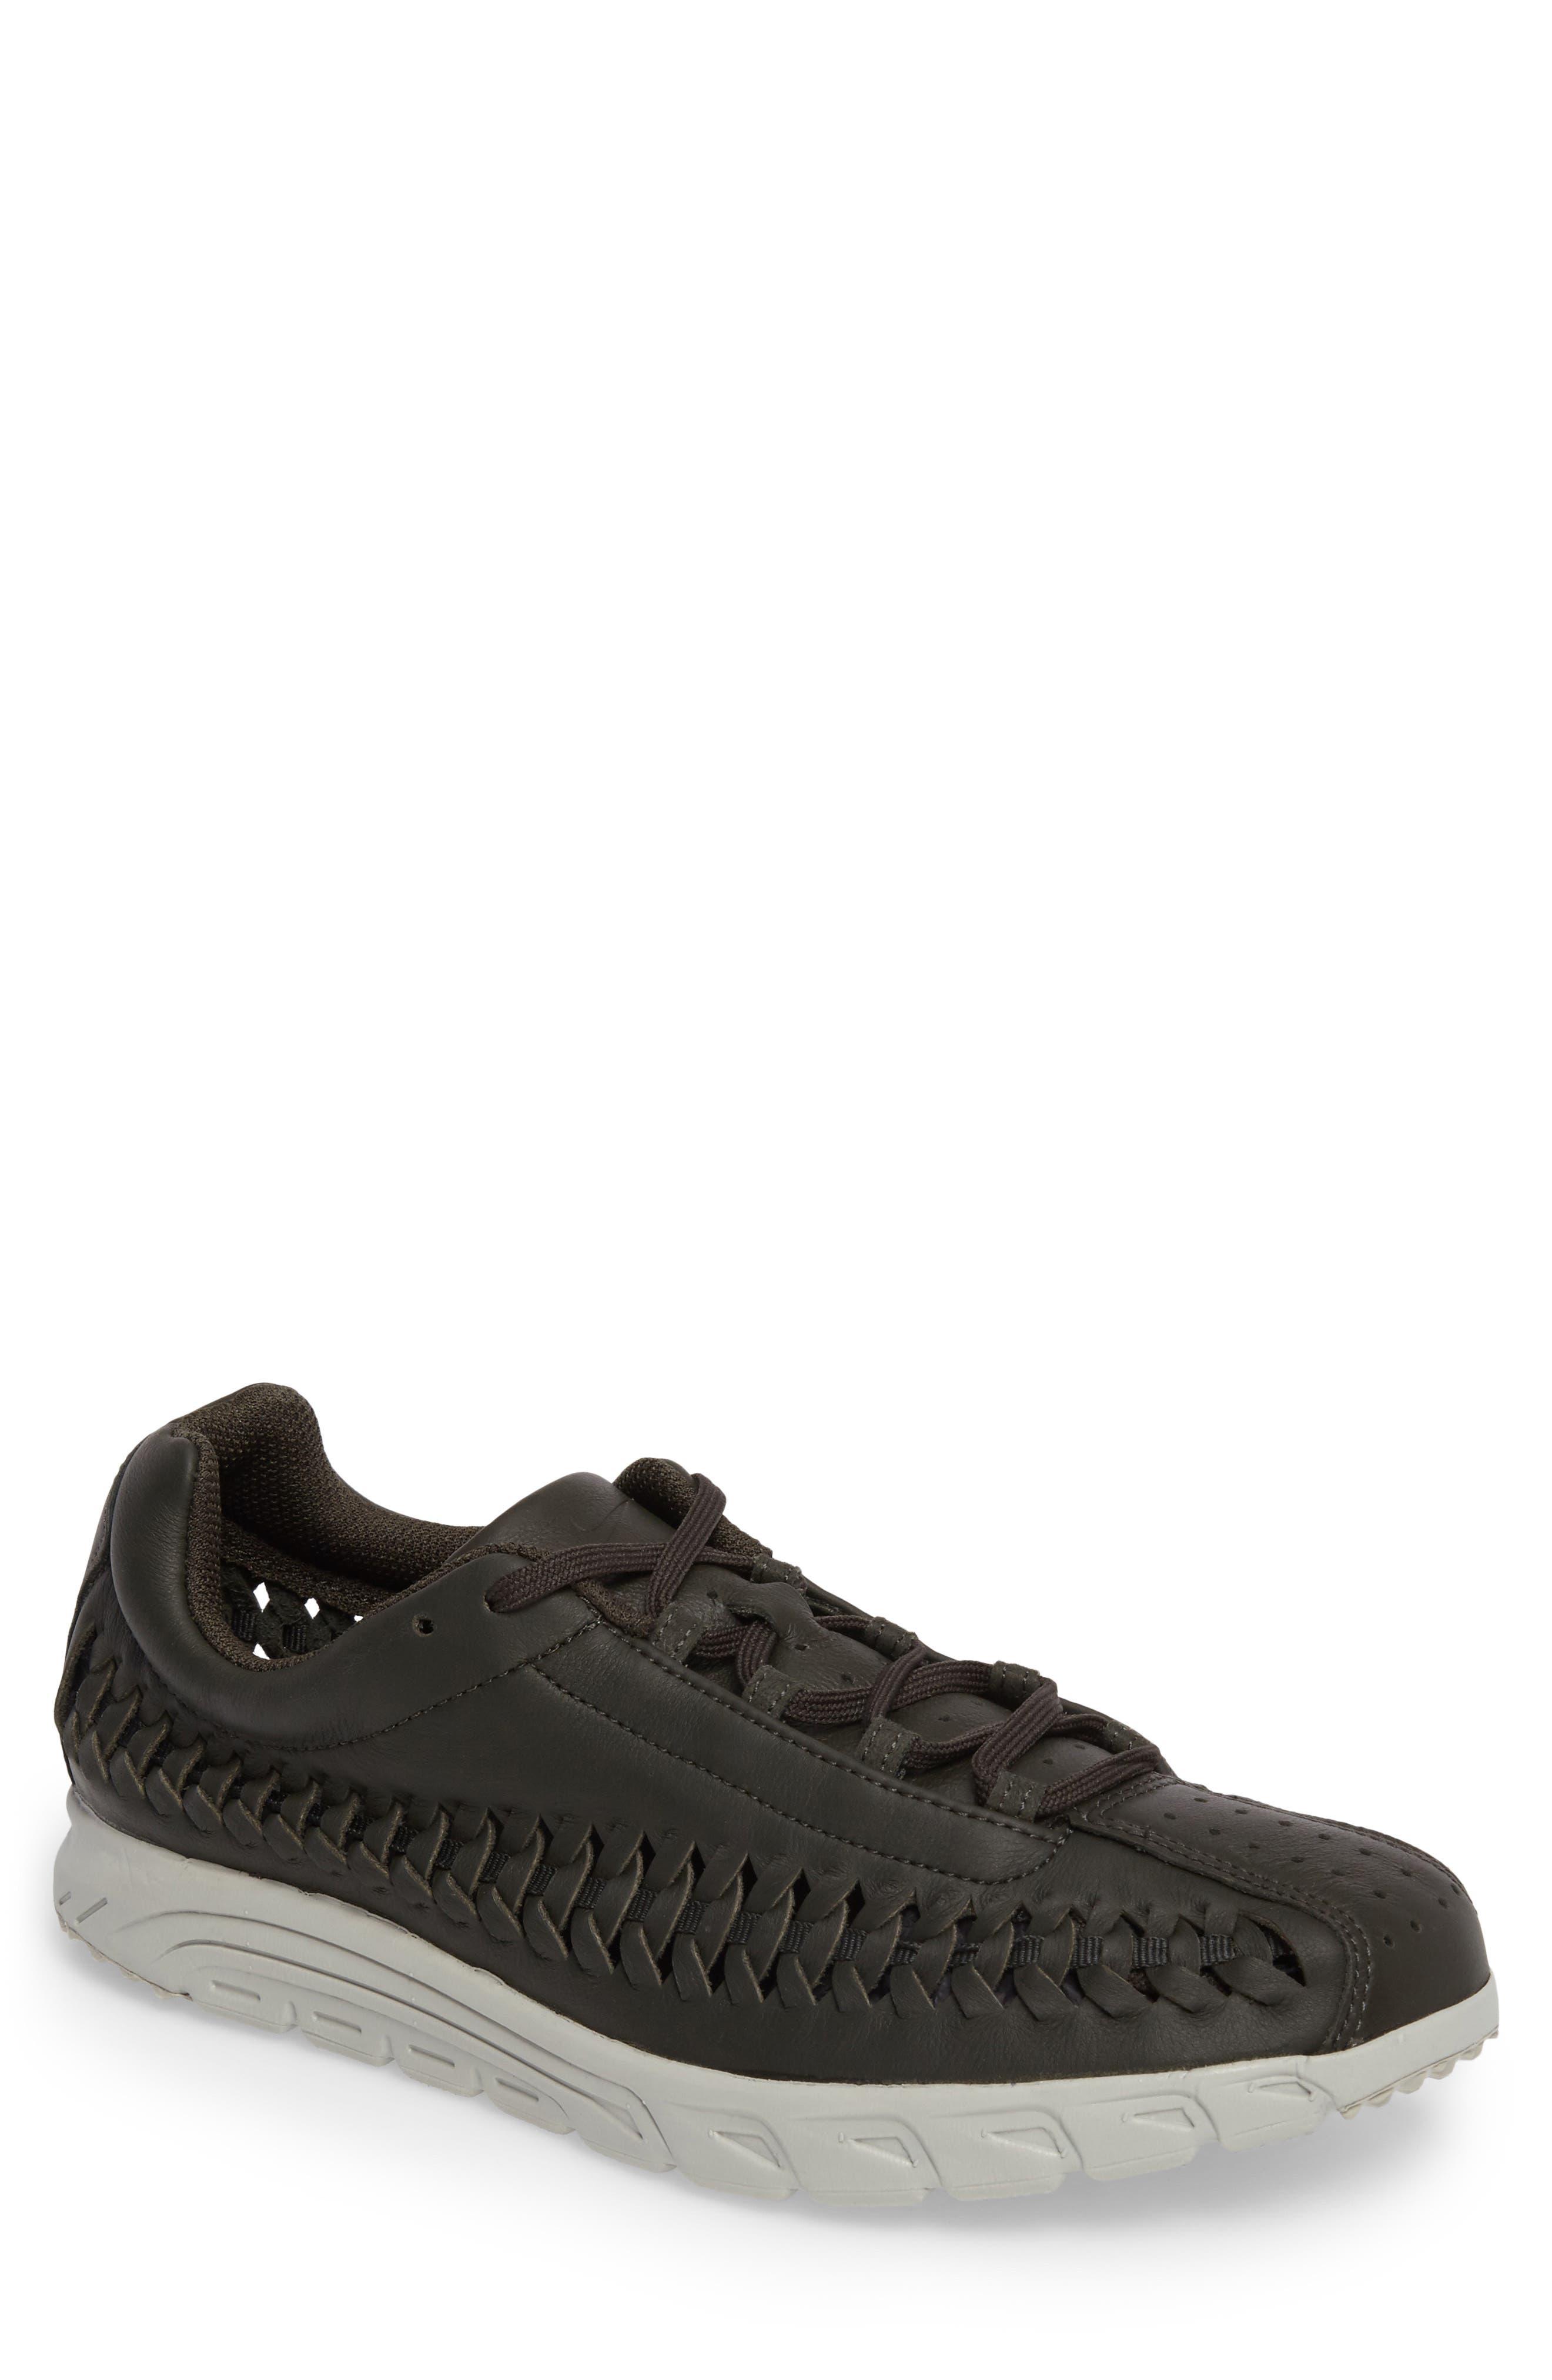 Alternate Image 1 Selected - Nike 'Mayfly' Sneaker (Men)